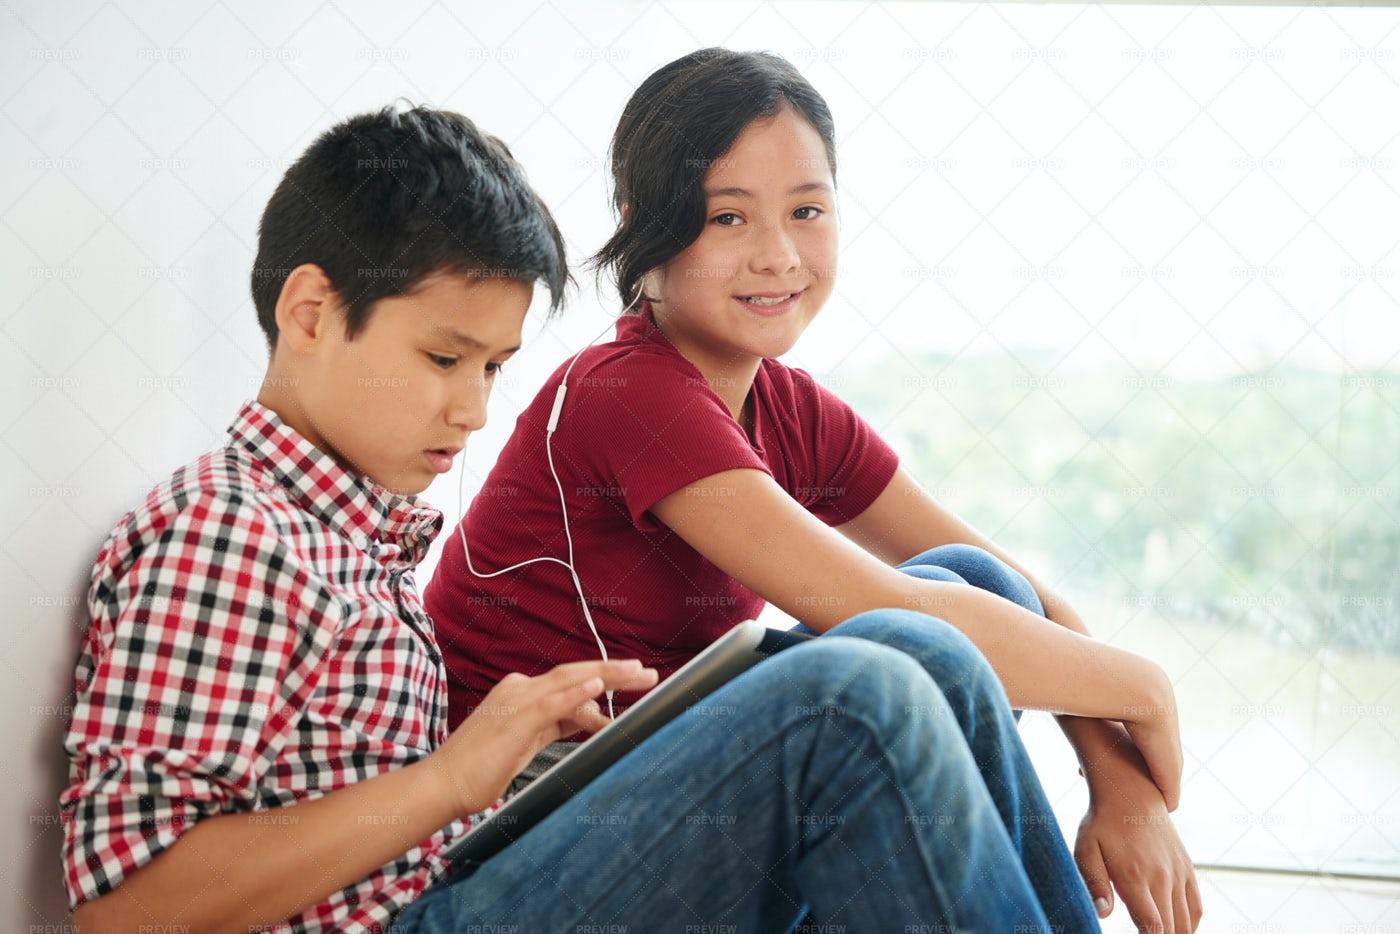 Children Listening To Music: Stock Photos